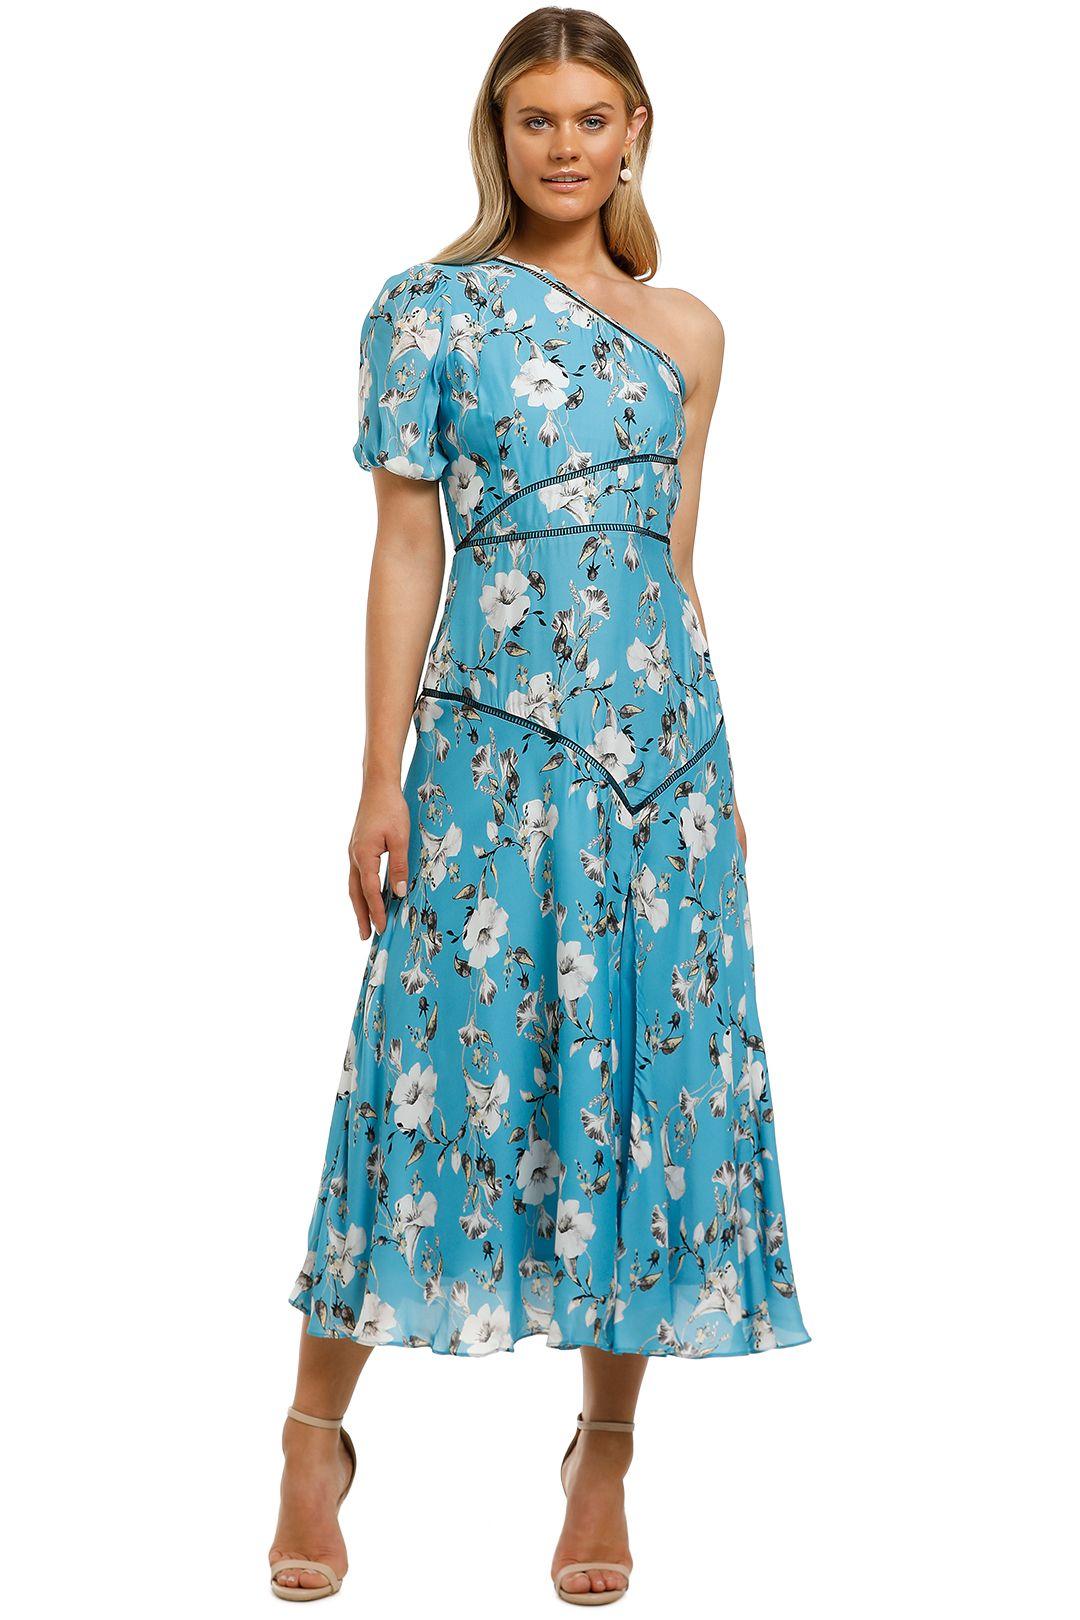 Talulah-Cannes-Midi-Dress-Blue-Valentine-Floral-Front